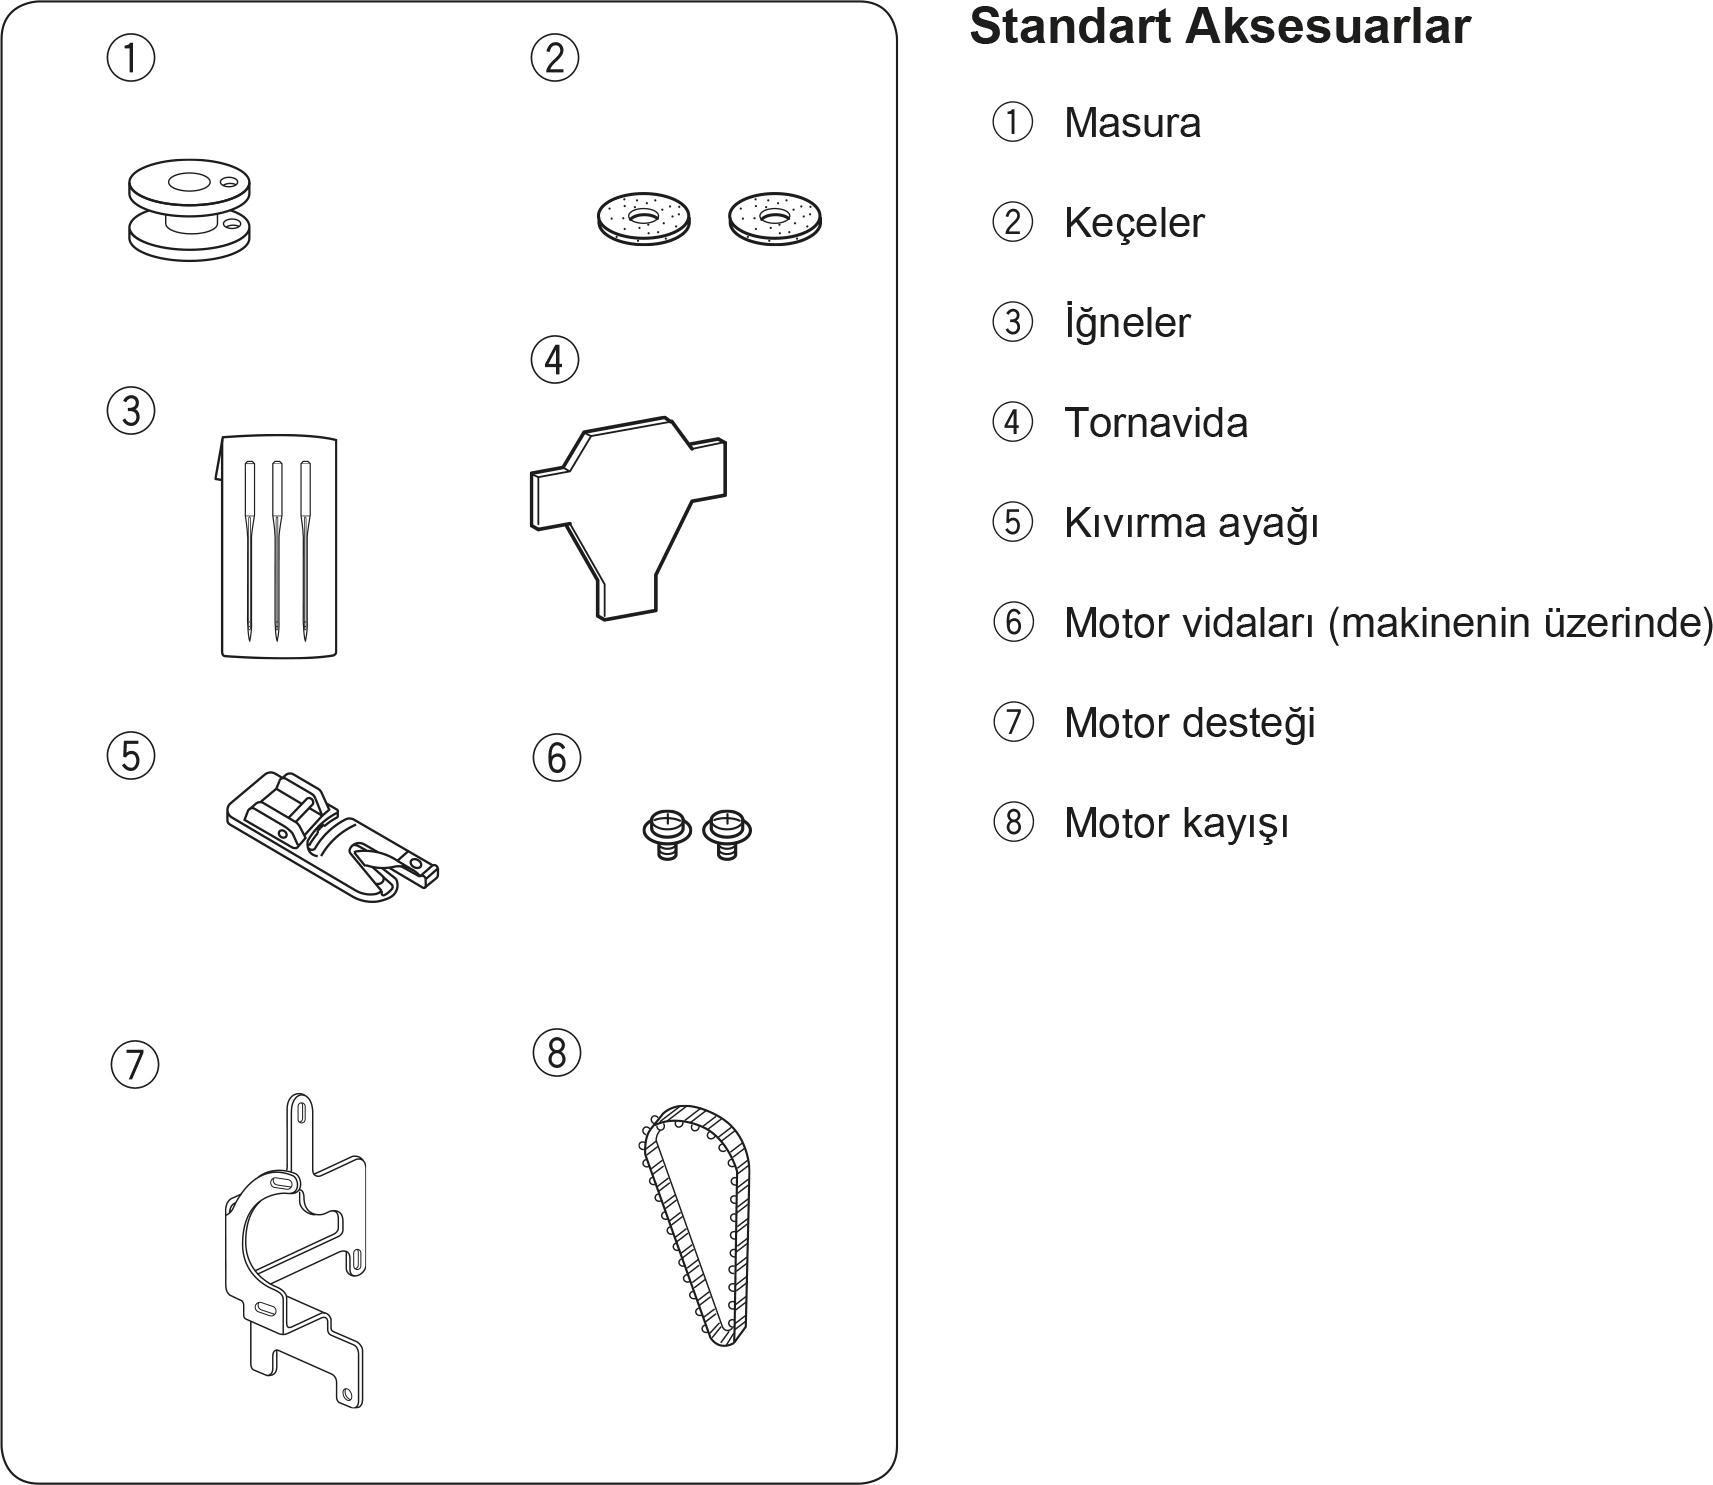 Janome 726 Standart Aksesuarlar.jpg (391 KB)